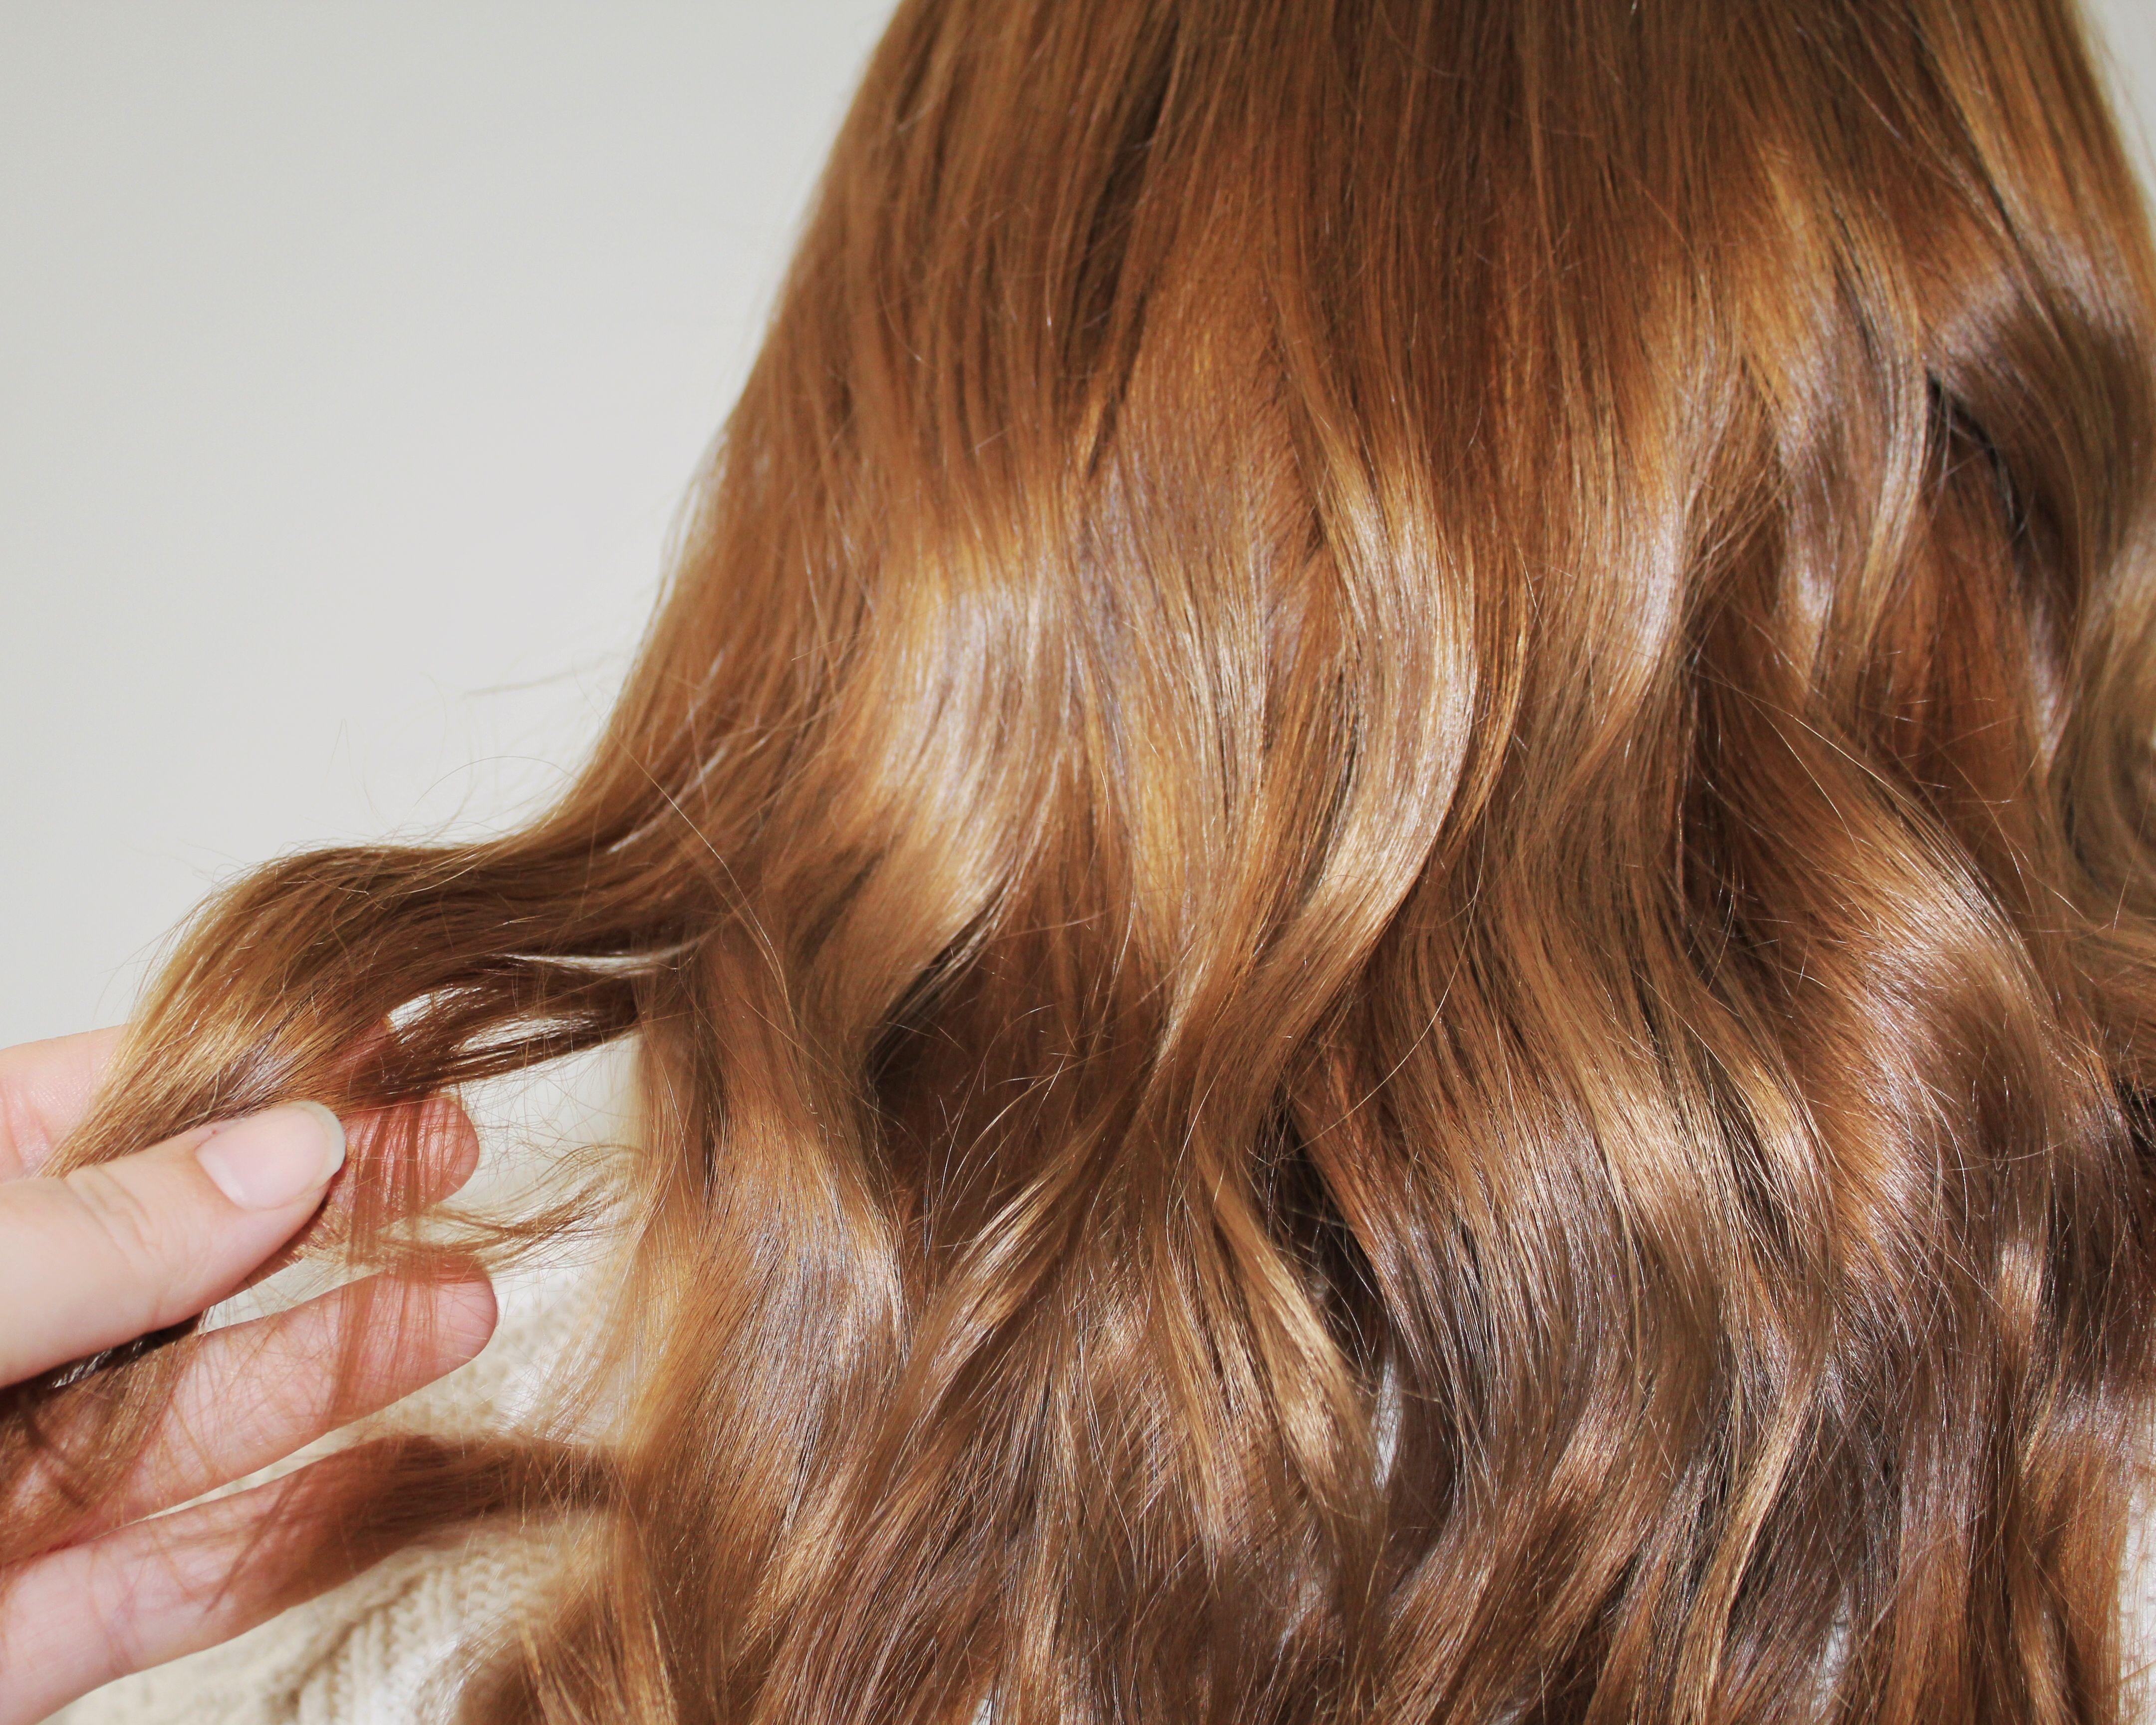 Salted Caramel Blonde In 2020 Caramel Blonde Hair Dark Blonde